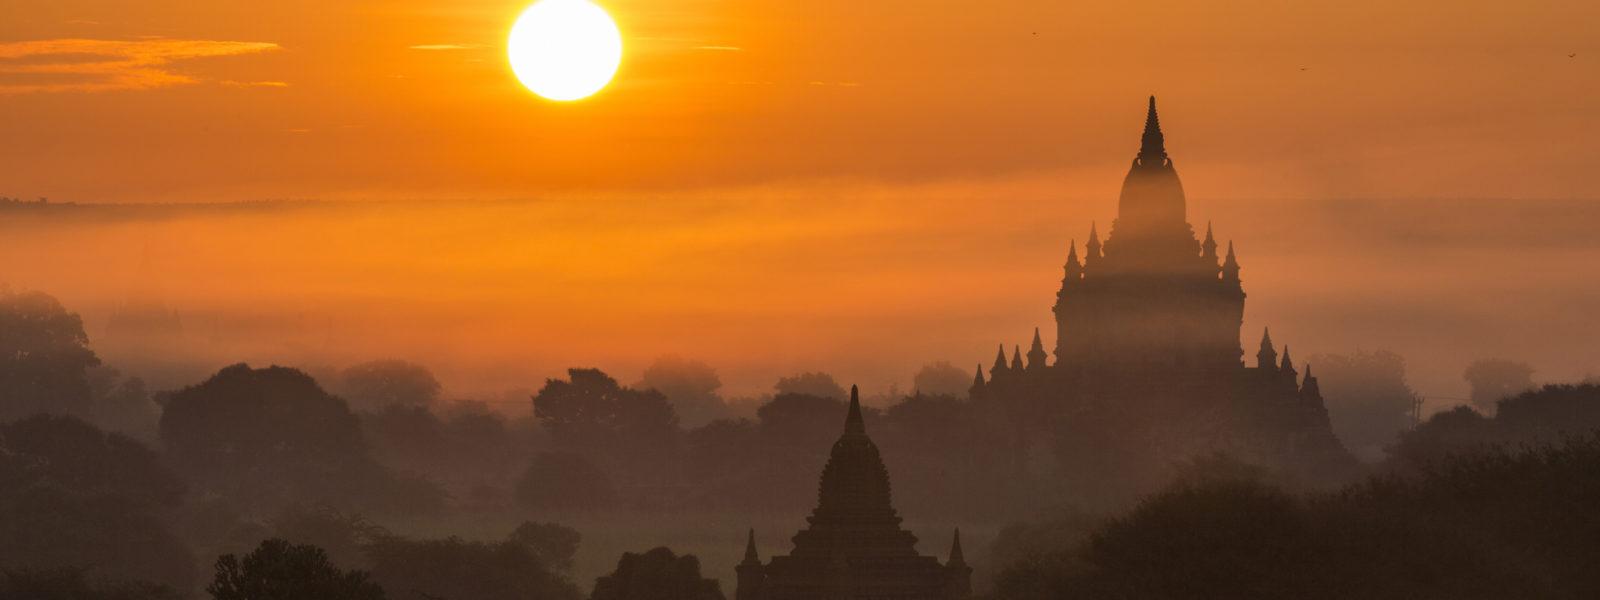 Destinations - Sunset at Bagan - Myanmar - Sampan Travel